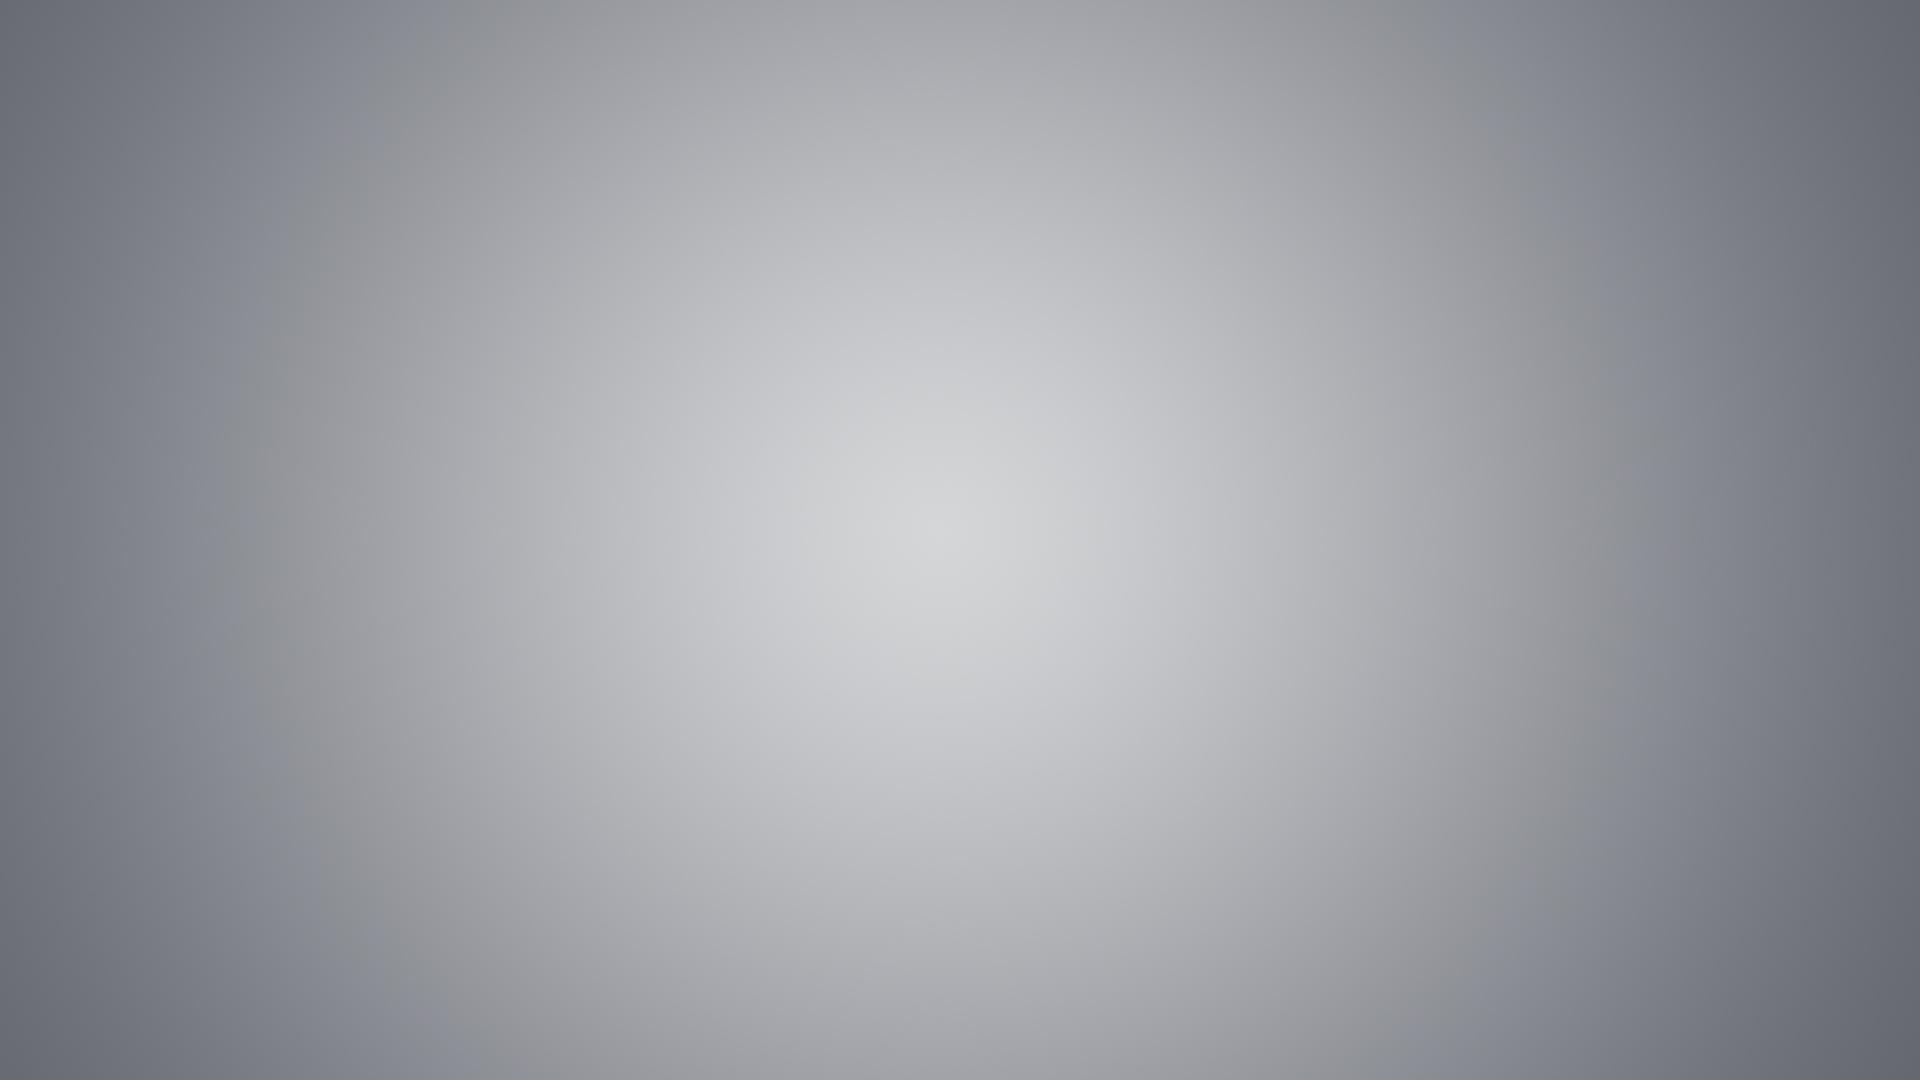 Background image 1080p - Start Background 1080p Windows 8 By Zaktech90 Customization Wallpaper